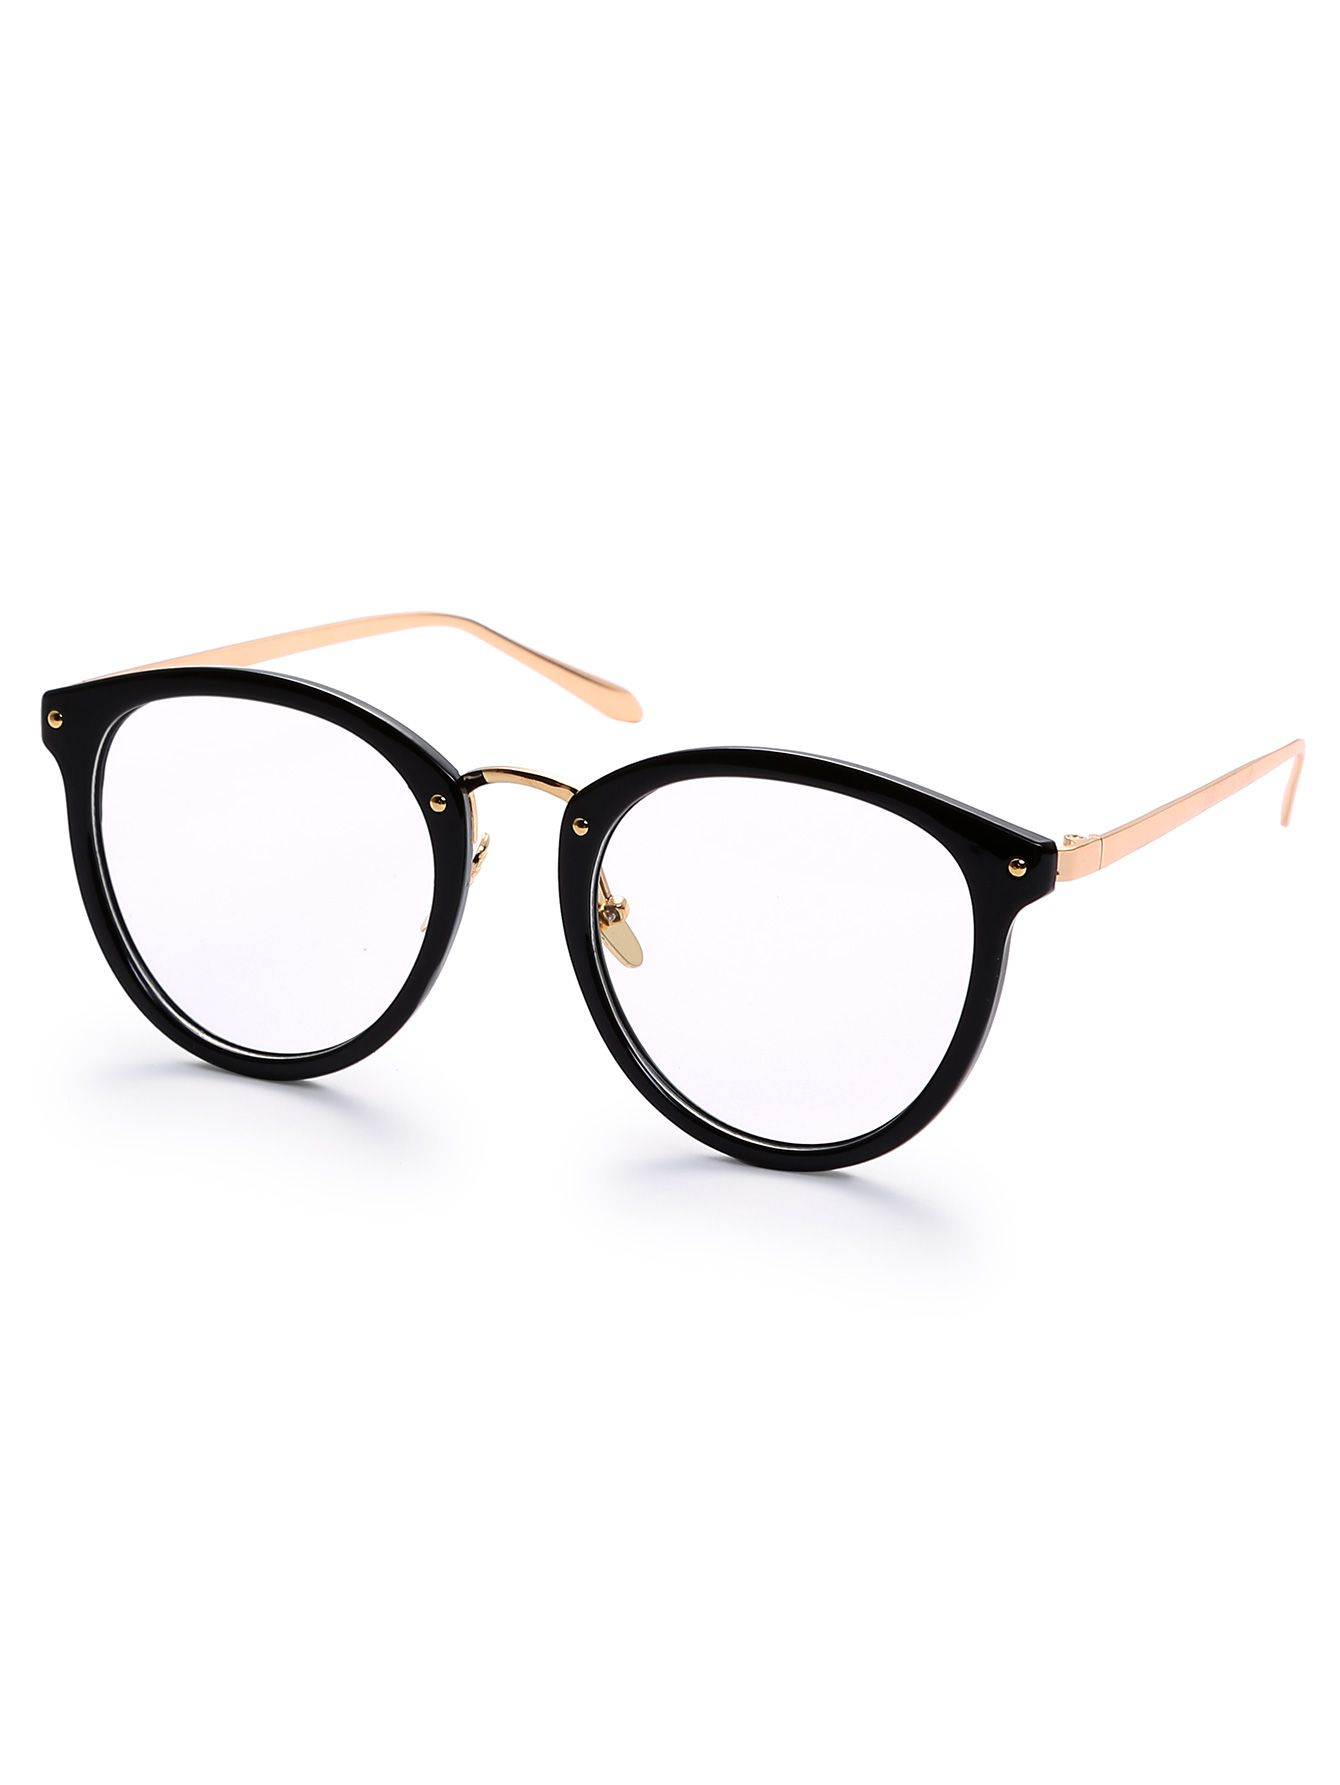 Black Round Frame Metallic Arms Sunglasses